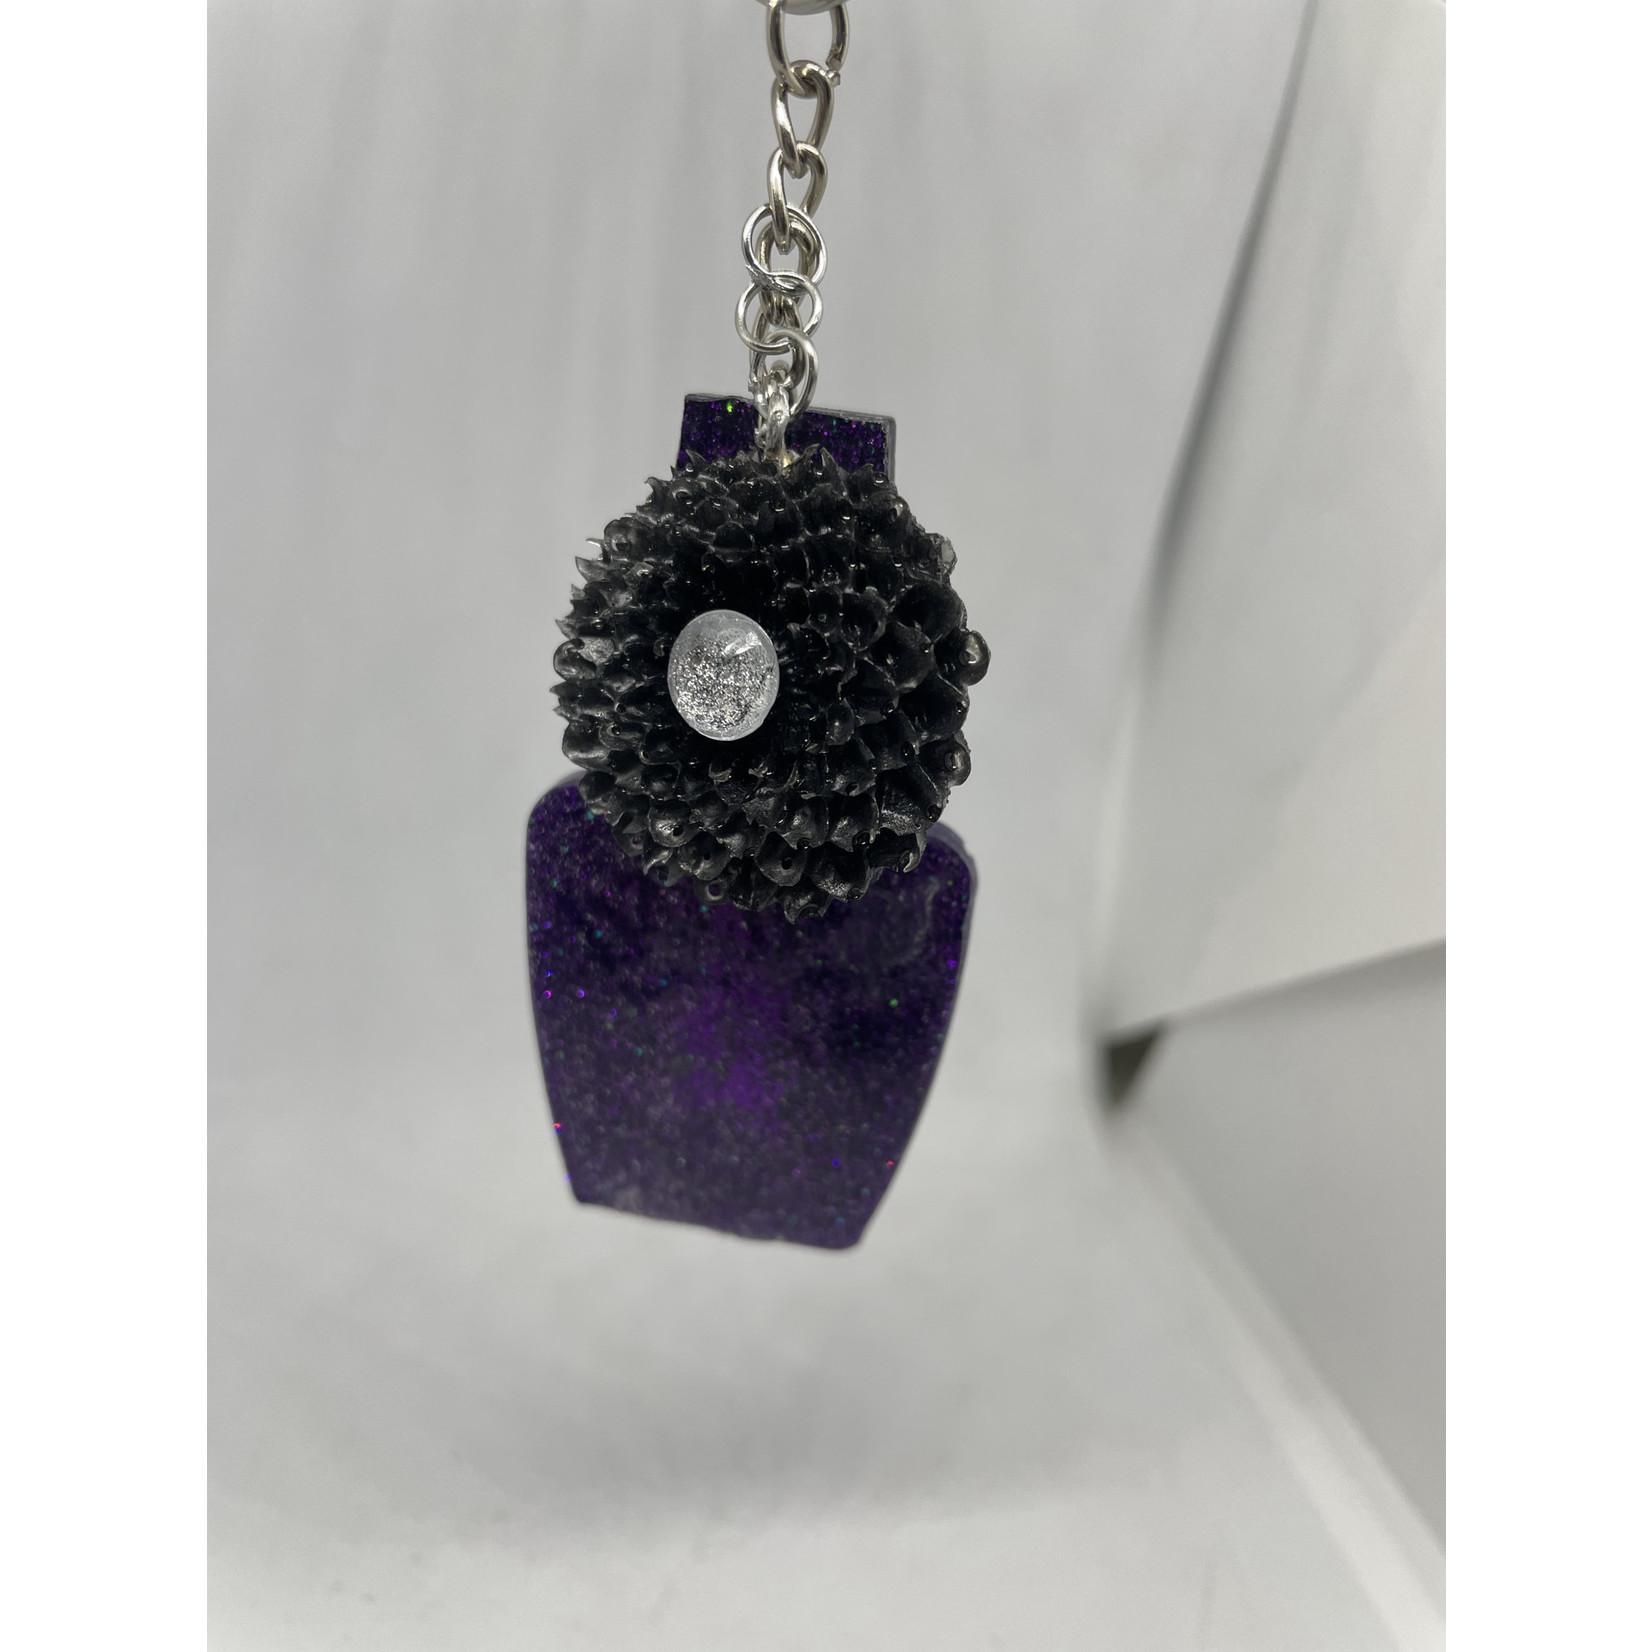 East Coast Sirens Sassy Purple Glitter Nail Polish Key Chain